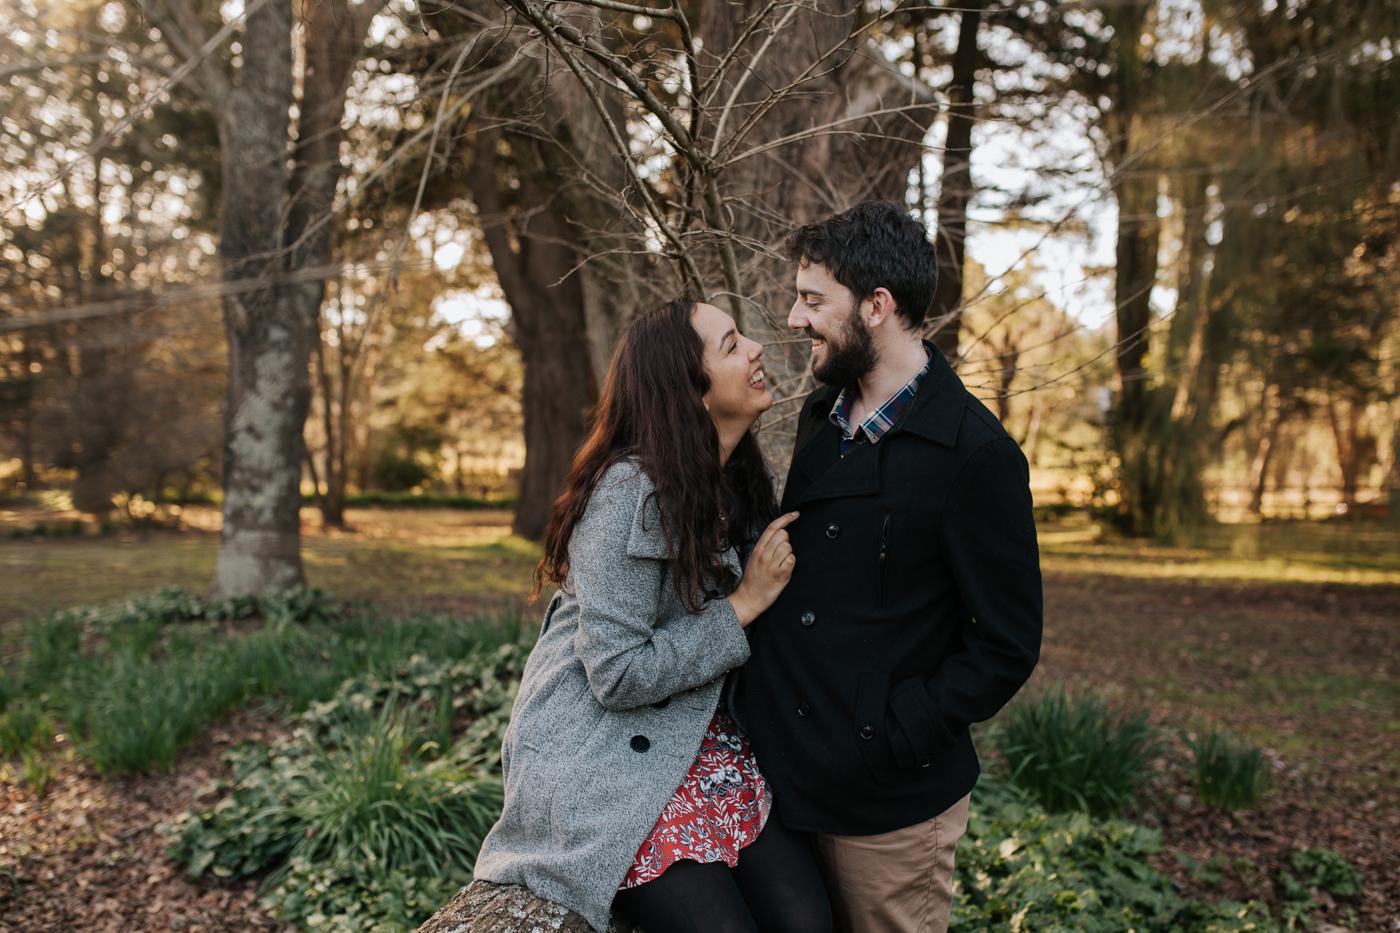 Kate & Kieran - Southern Highlands Engagement - Samantha Heather Photography-21.jpg